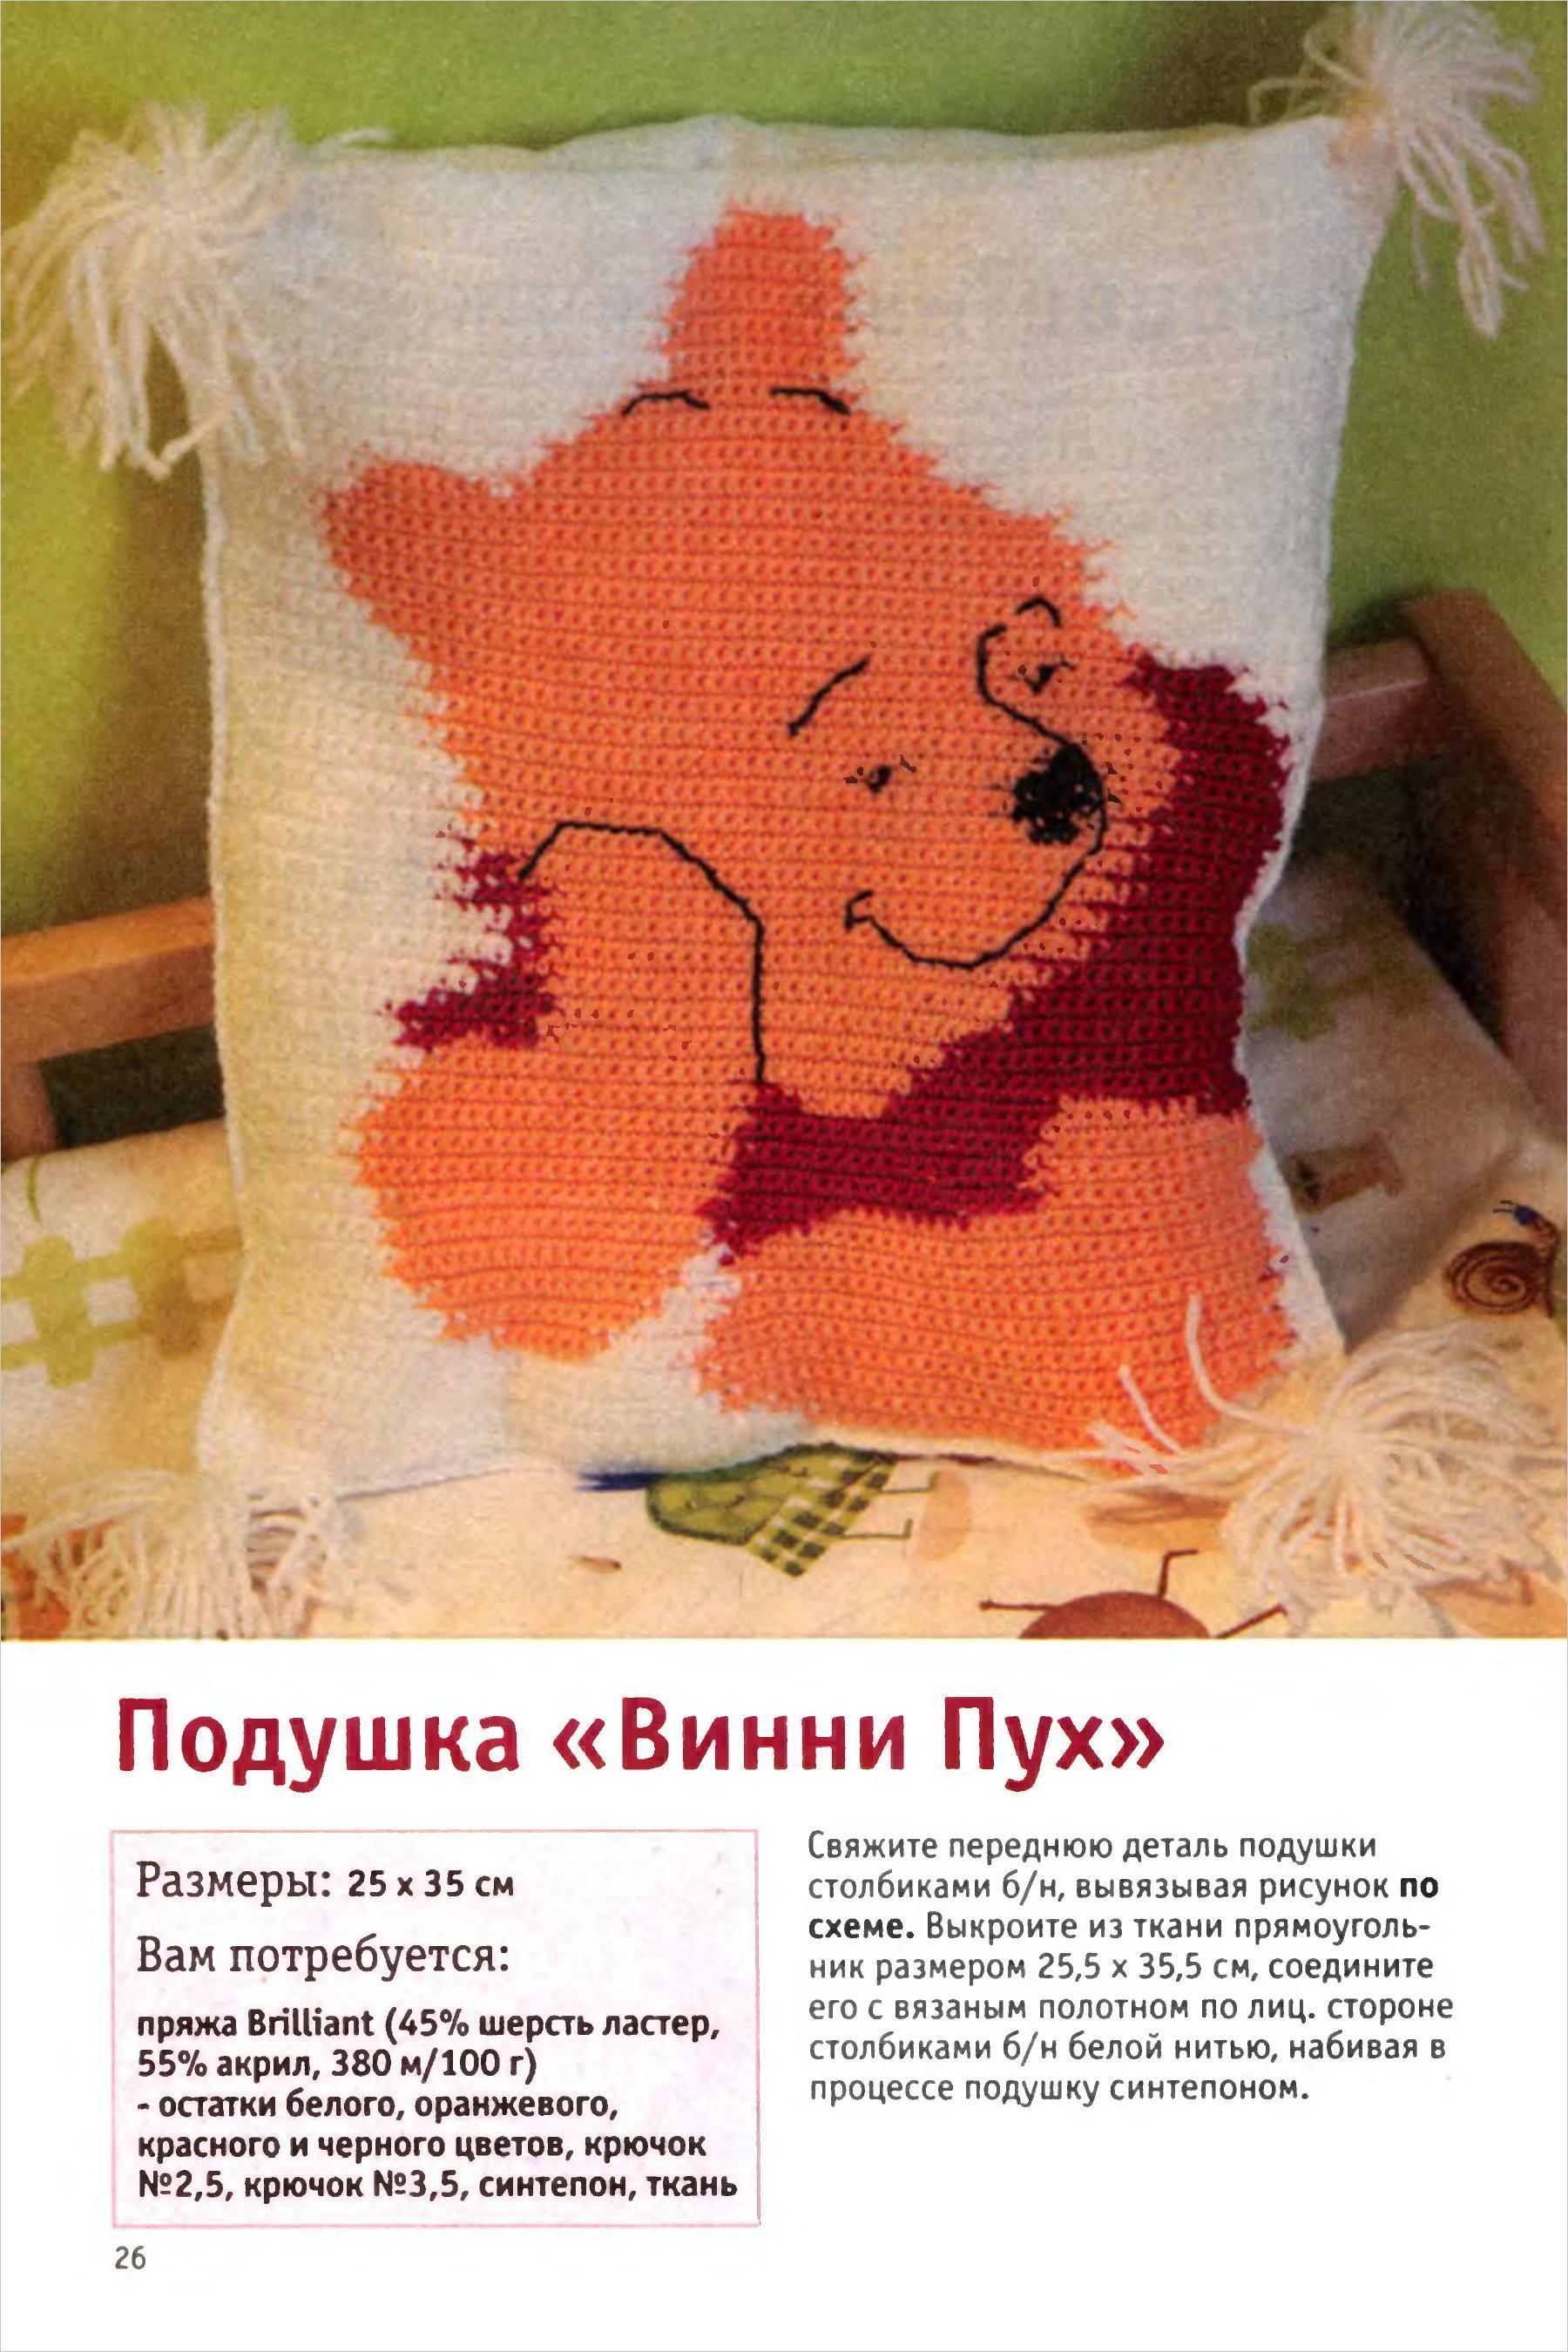 Подушка с Винни Пухом